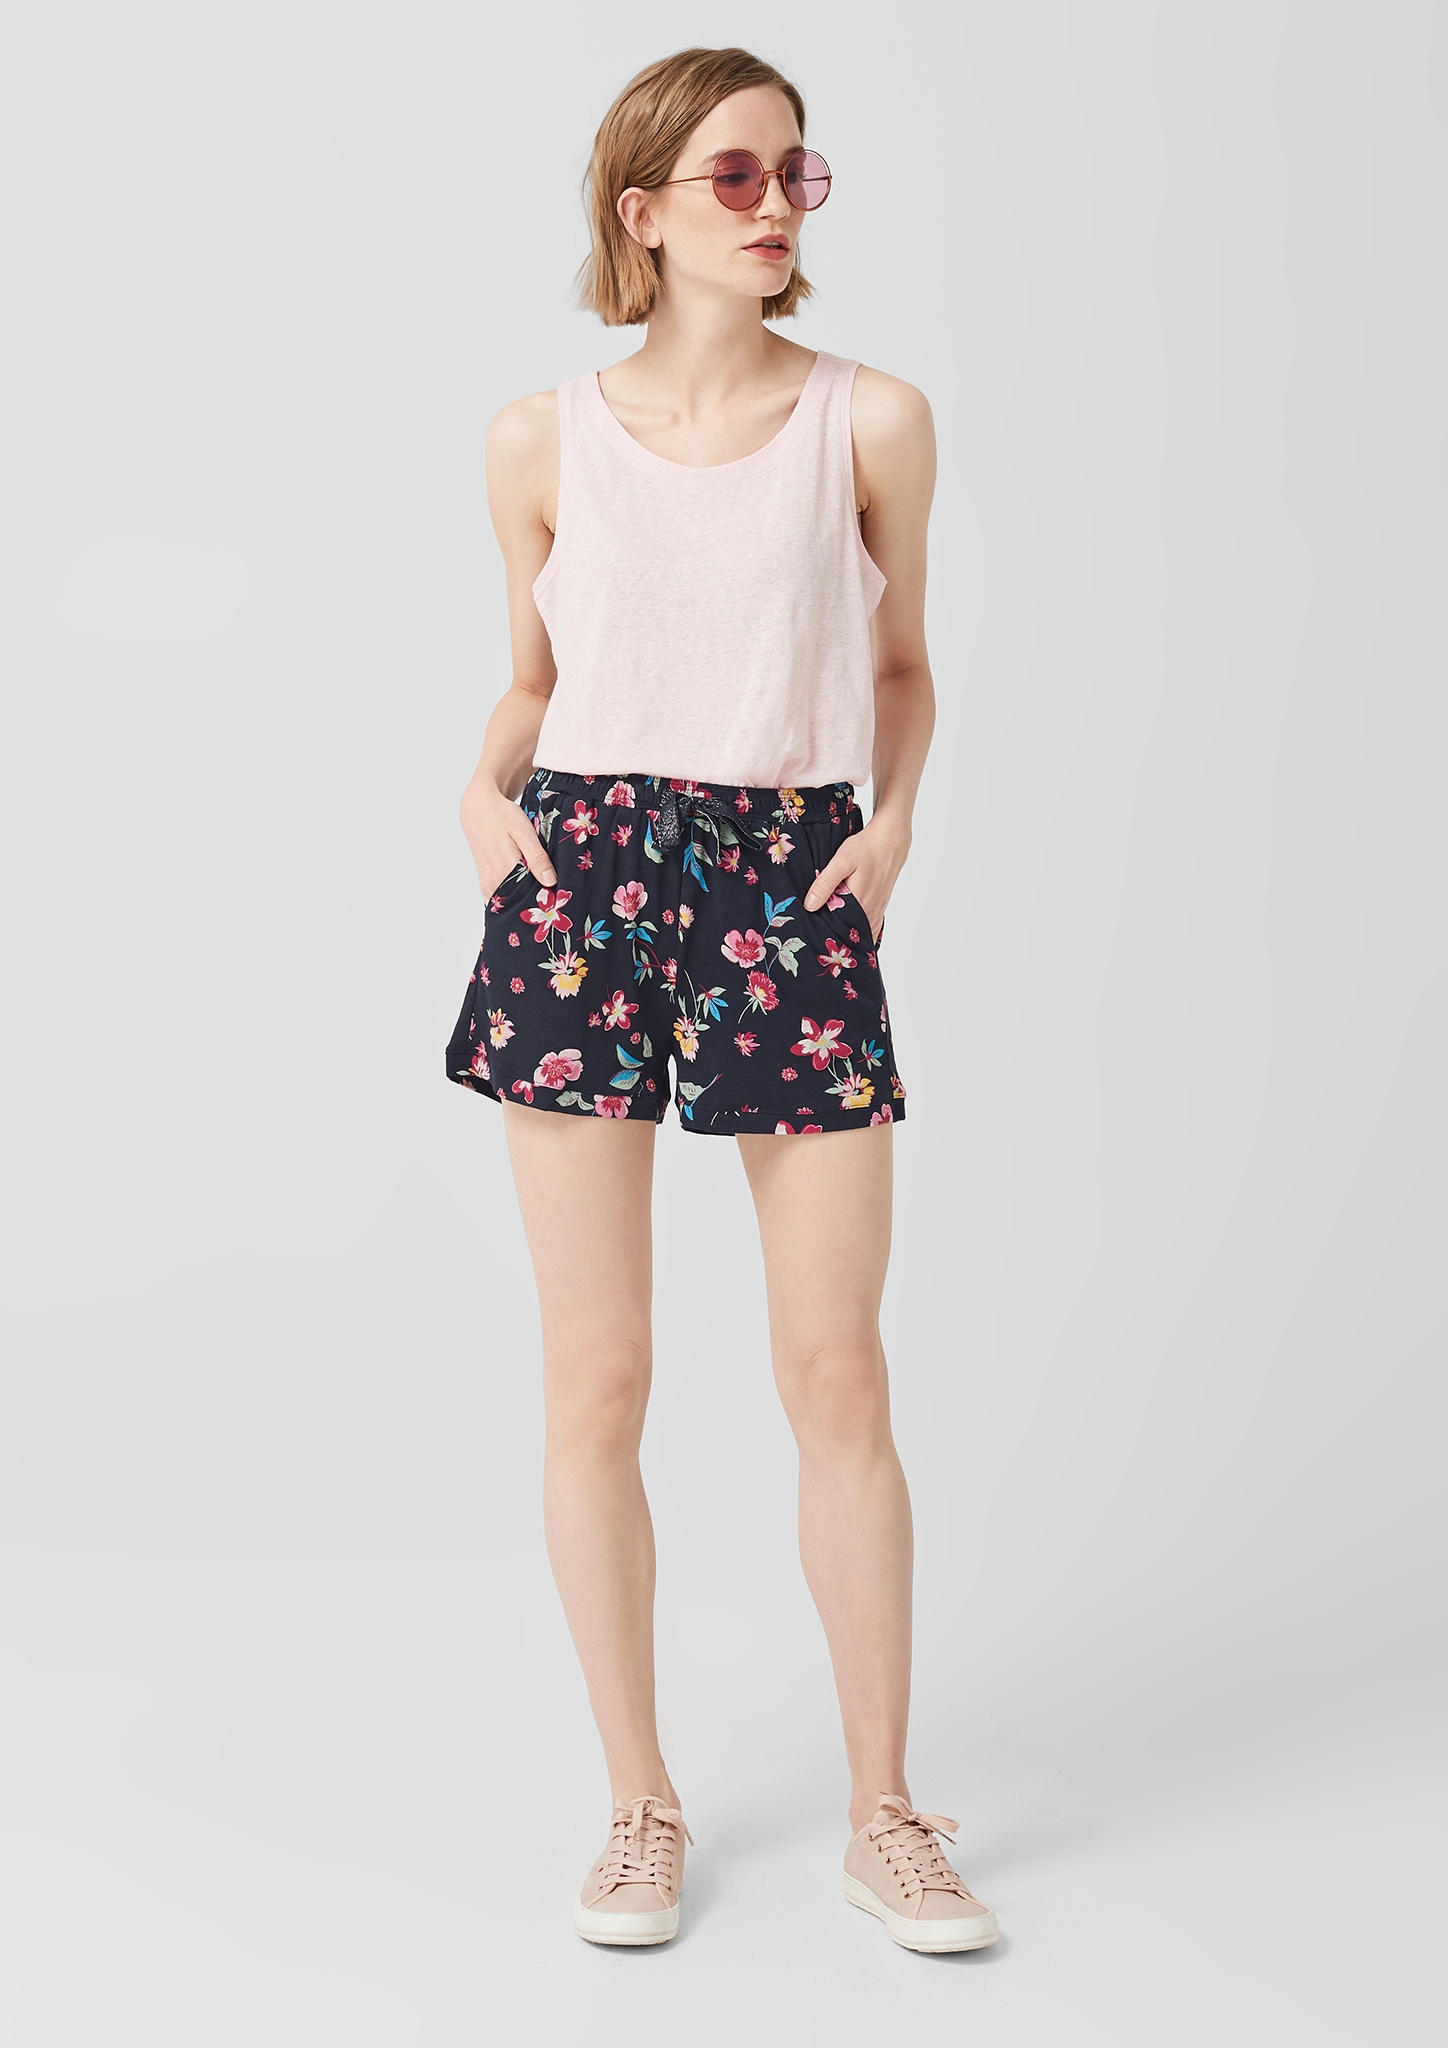 s-Oliver-Casual-Women-Jerseyshorts-mit-Musterprint-Neu Indexbild 14